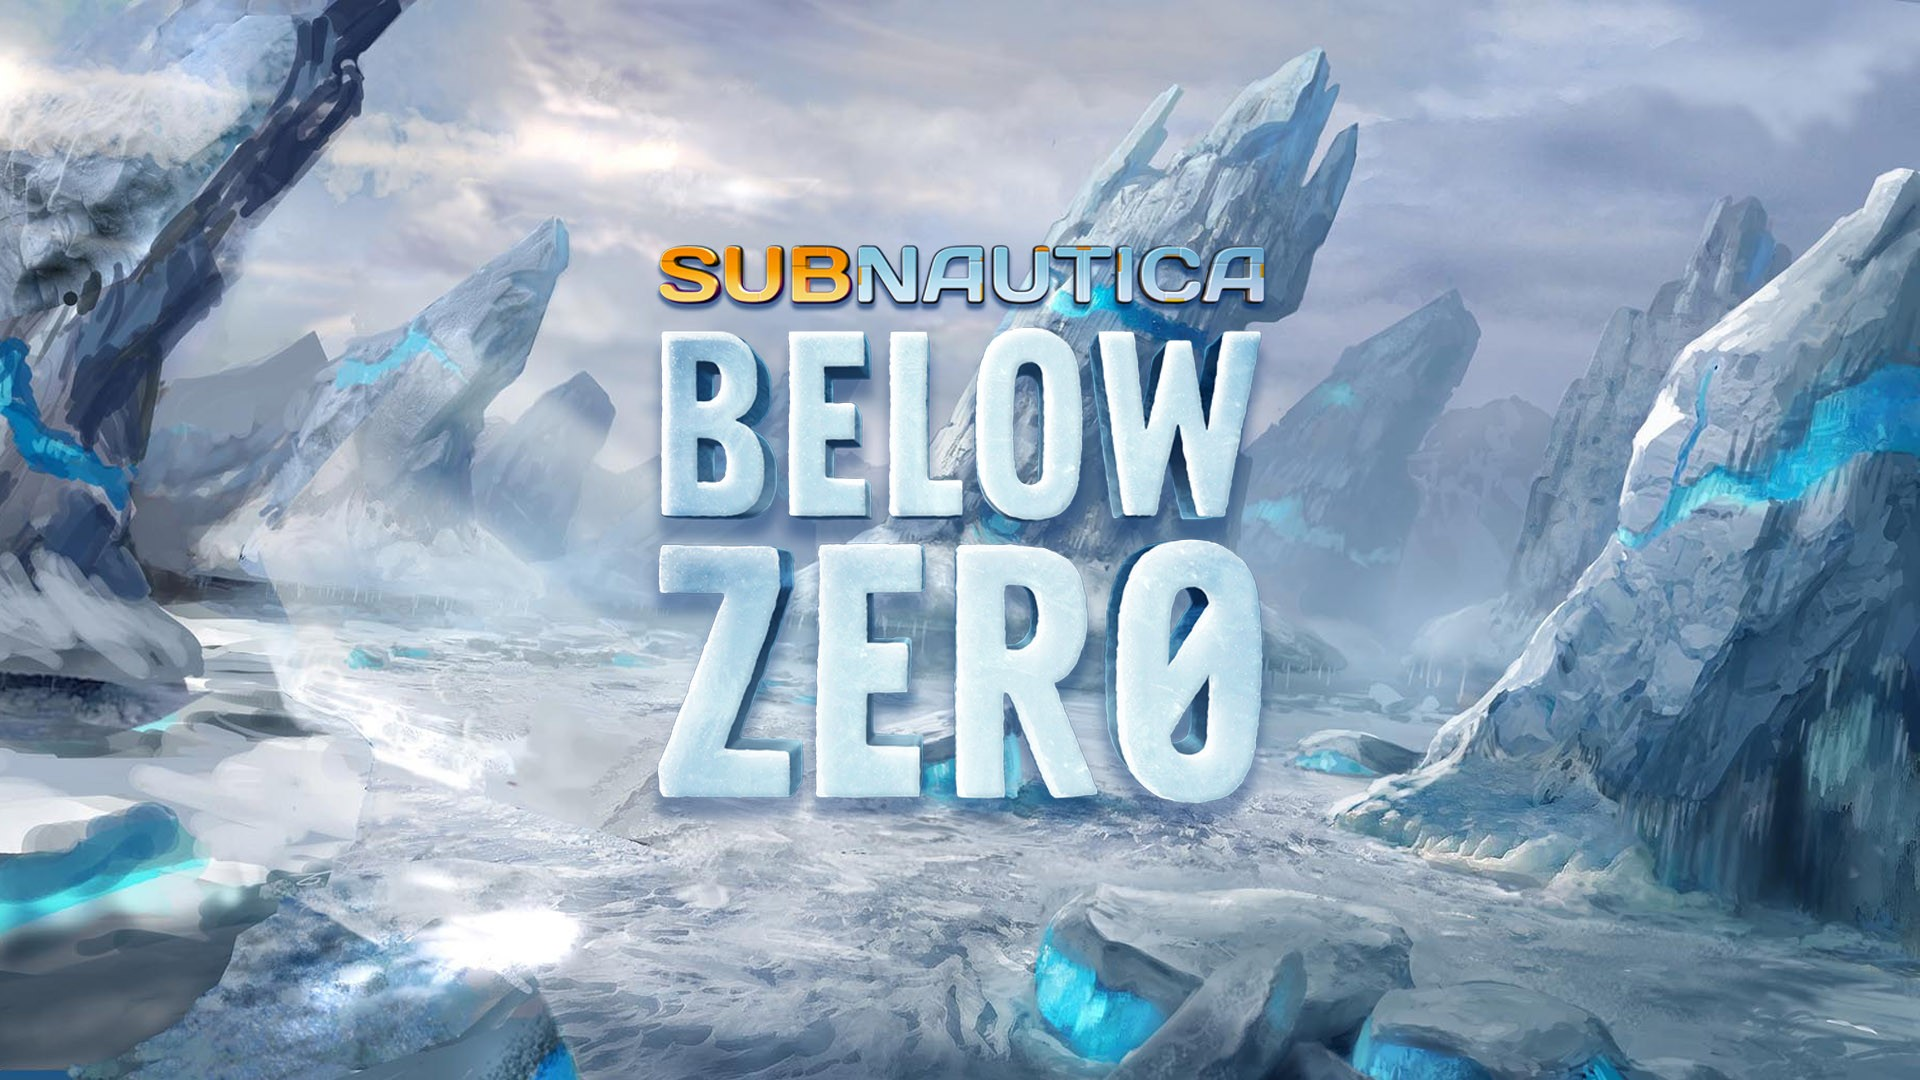 Вышел новый трейлер Subnautica Below Zero